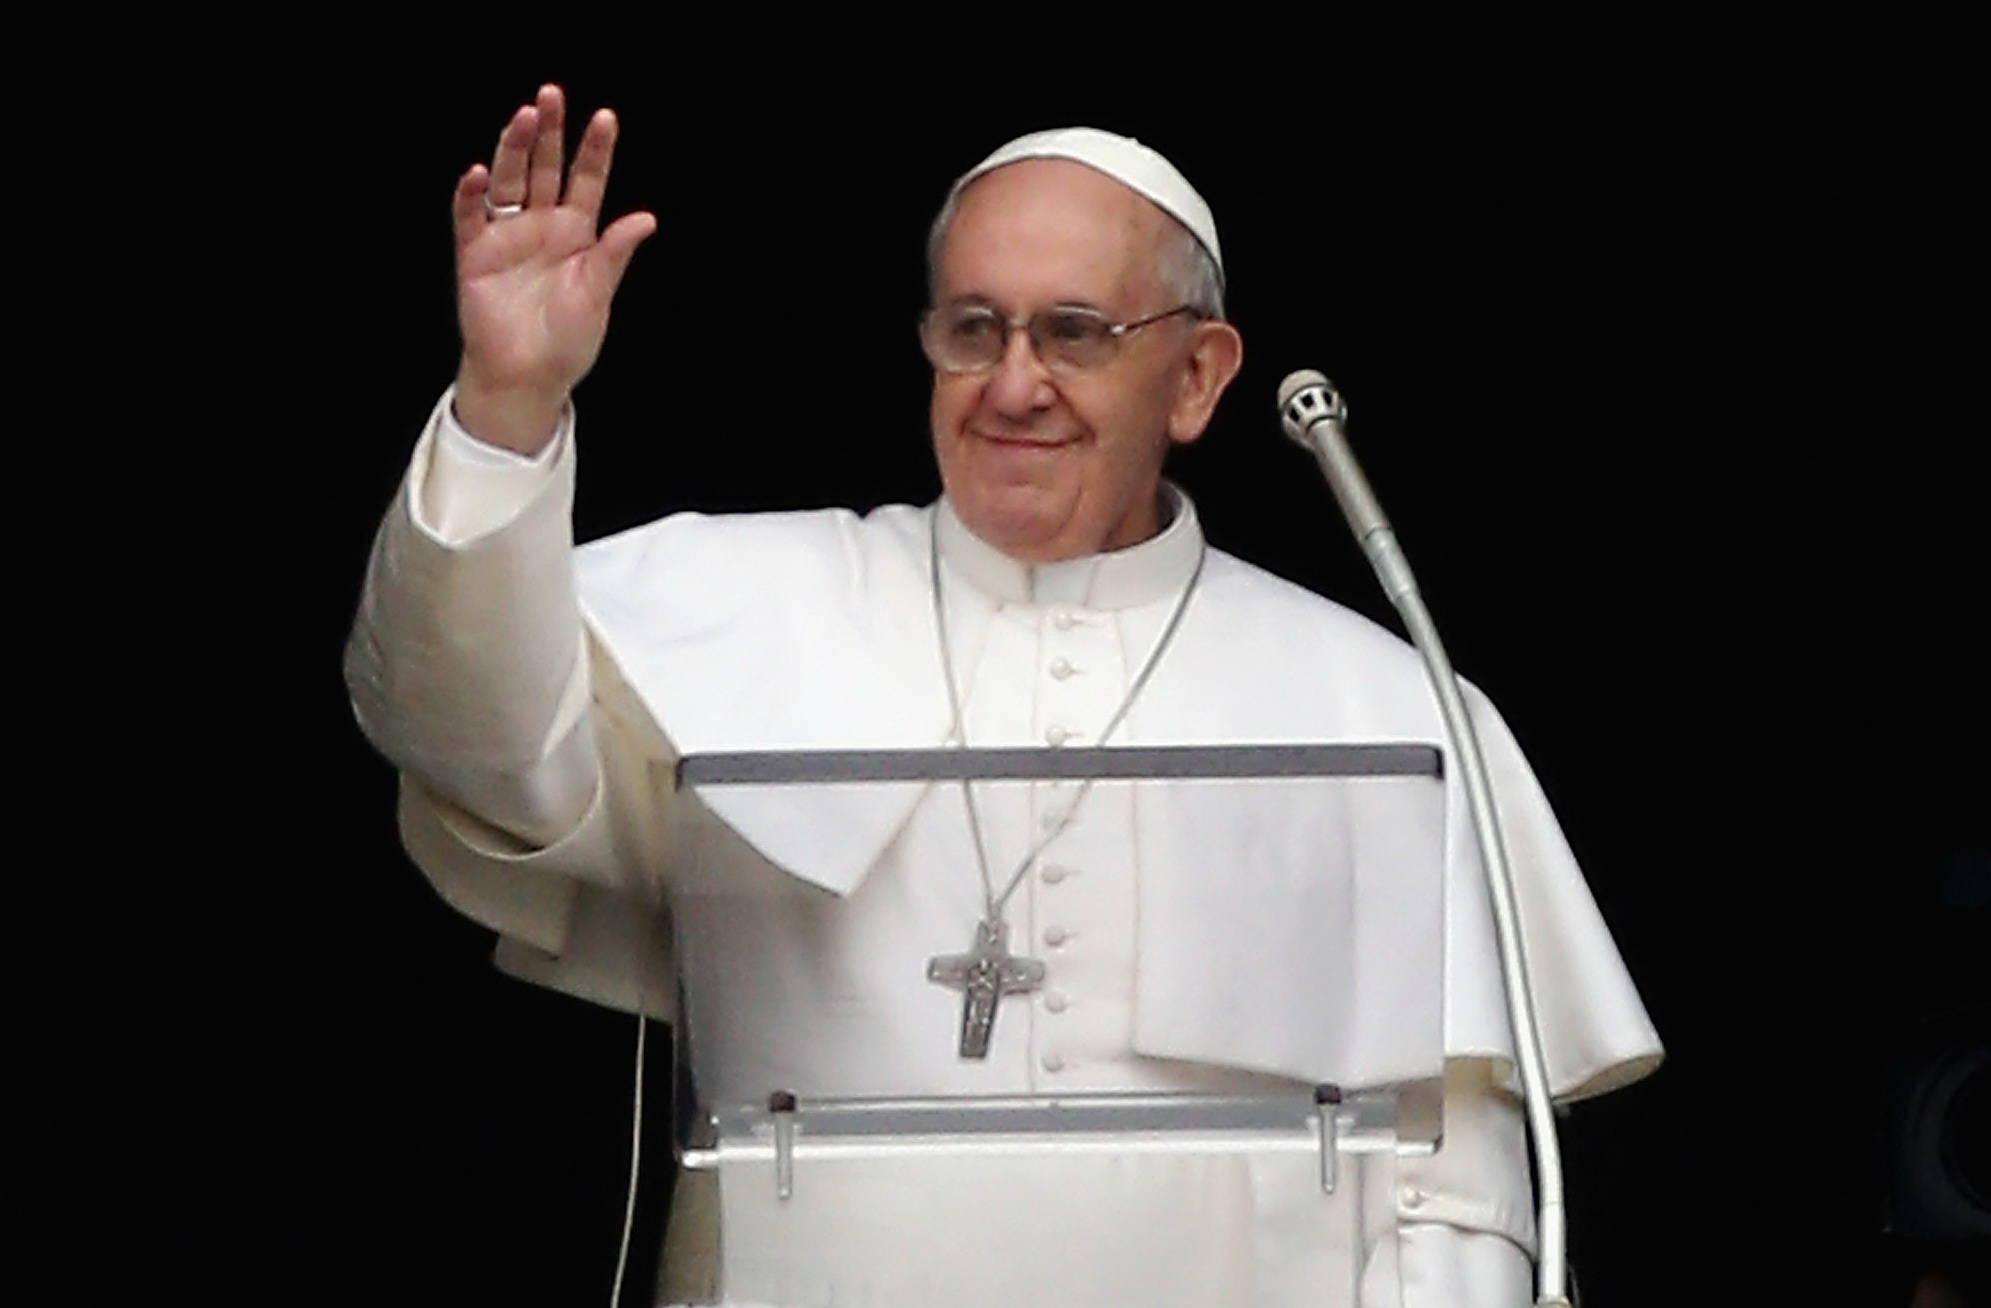 Papa Francisc, primul mesaj pe Twitter: Continuati sa va rugati pentru mine